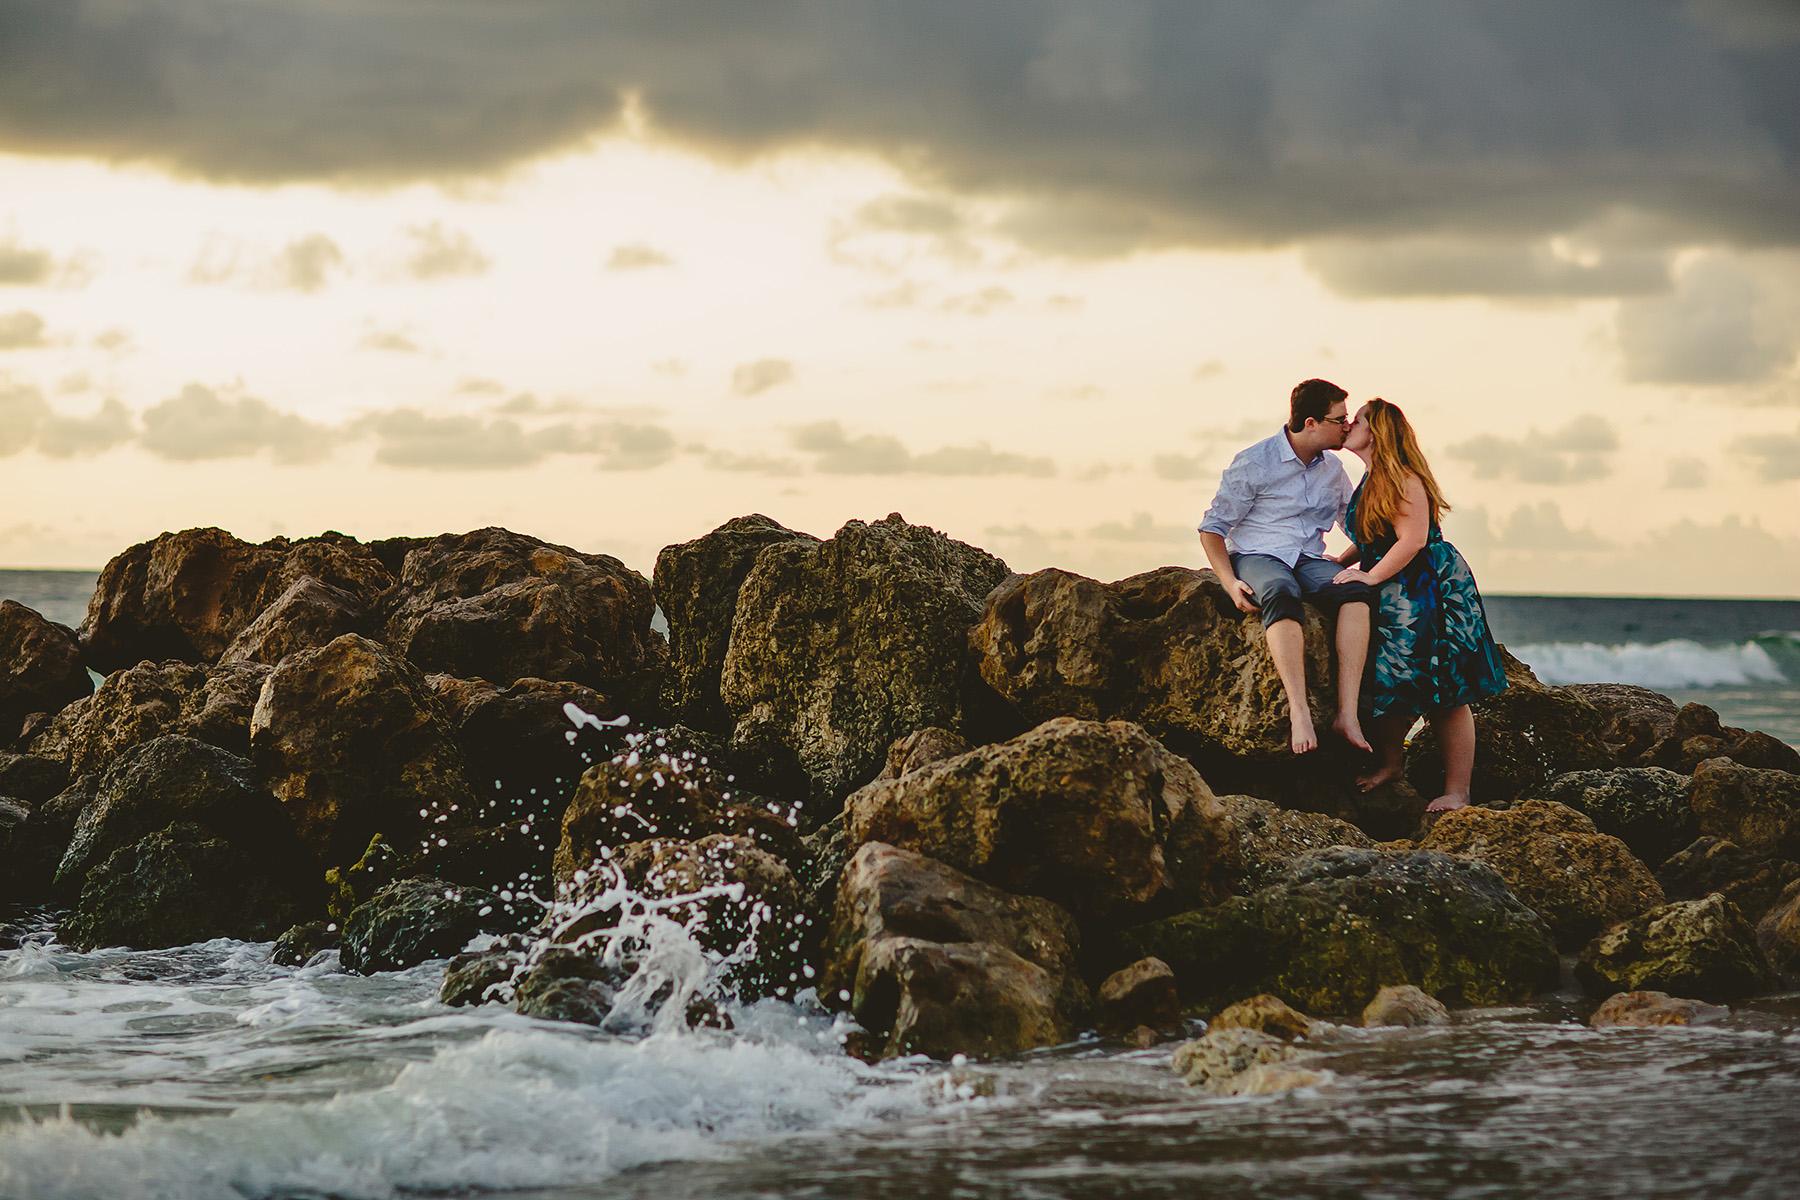 romantic-intimate-engagement-session-rocks-waves-tiny-house-photo.jpg